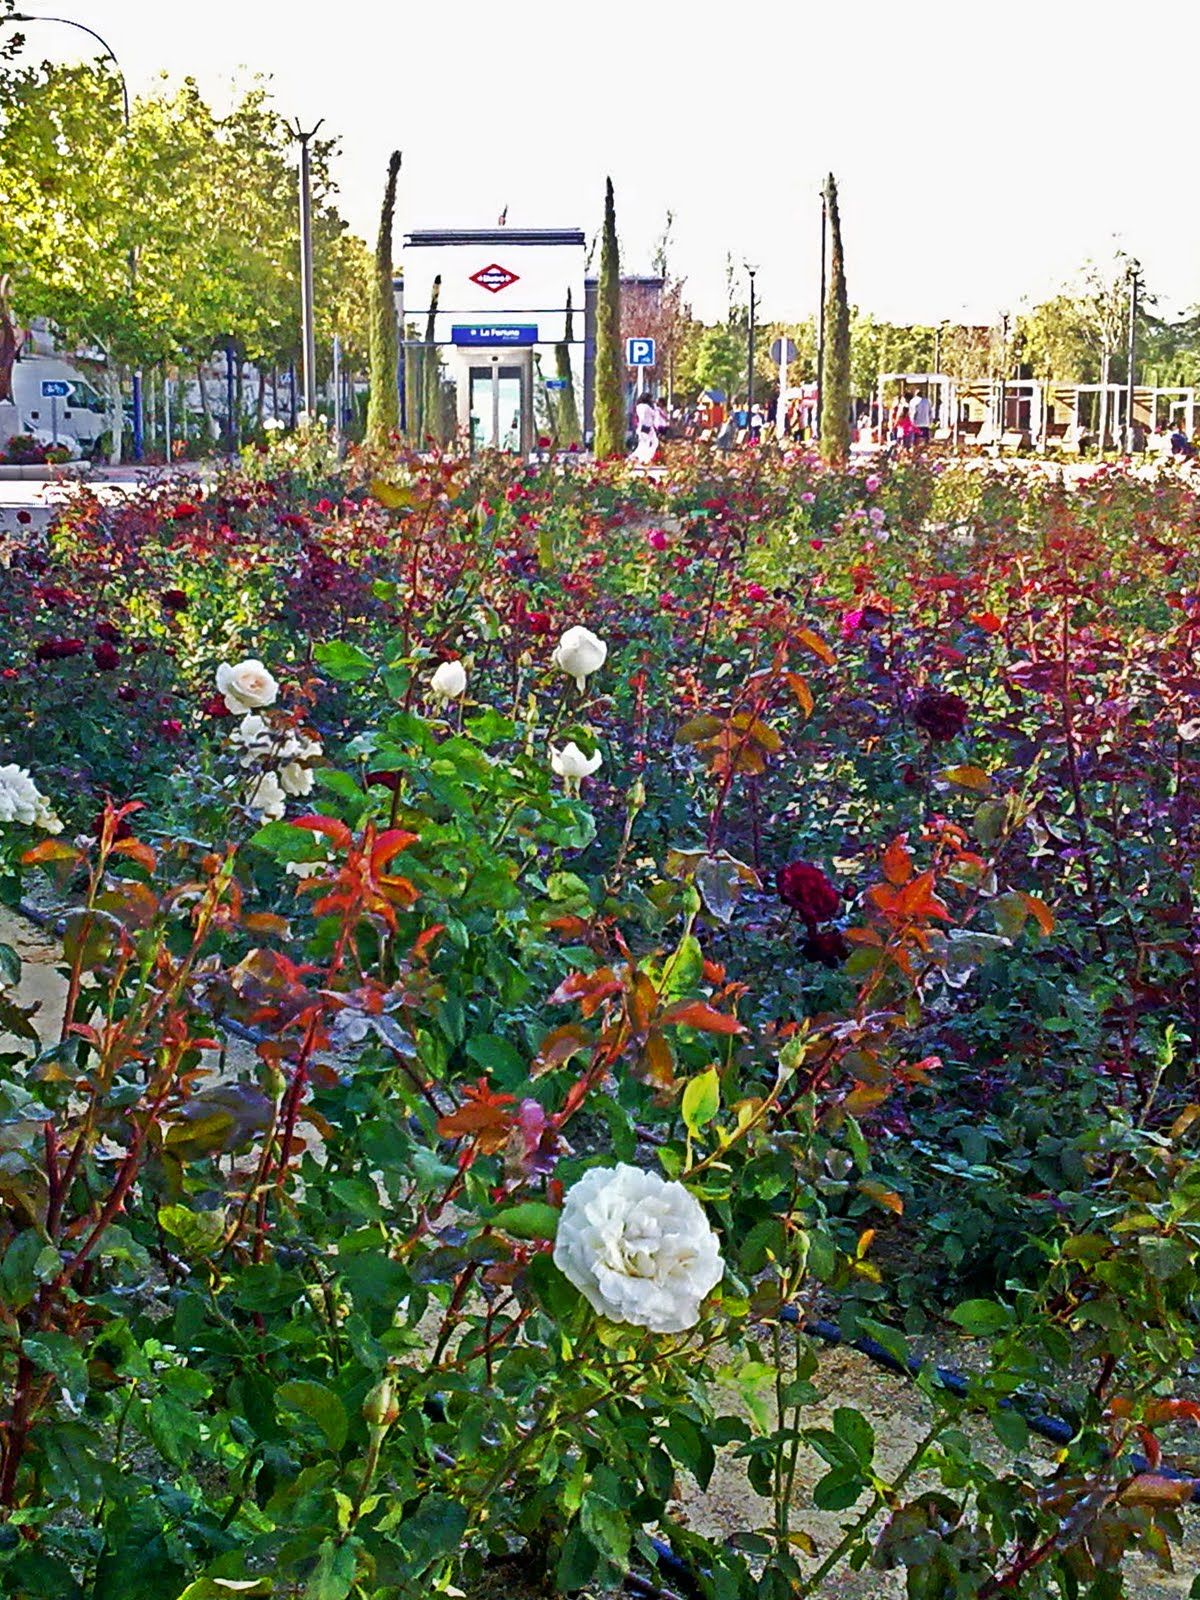 Jardin de rosas for Annette moreno jardin de rosas